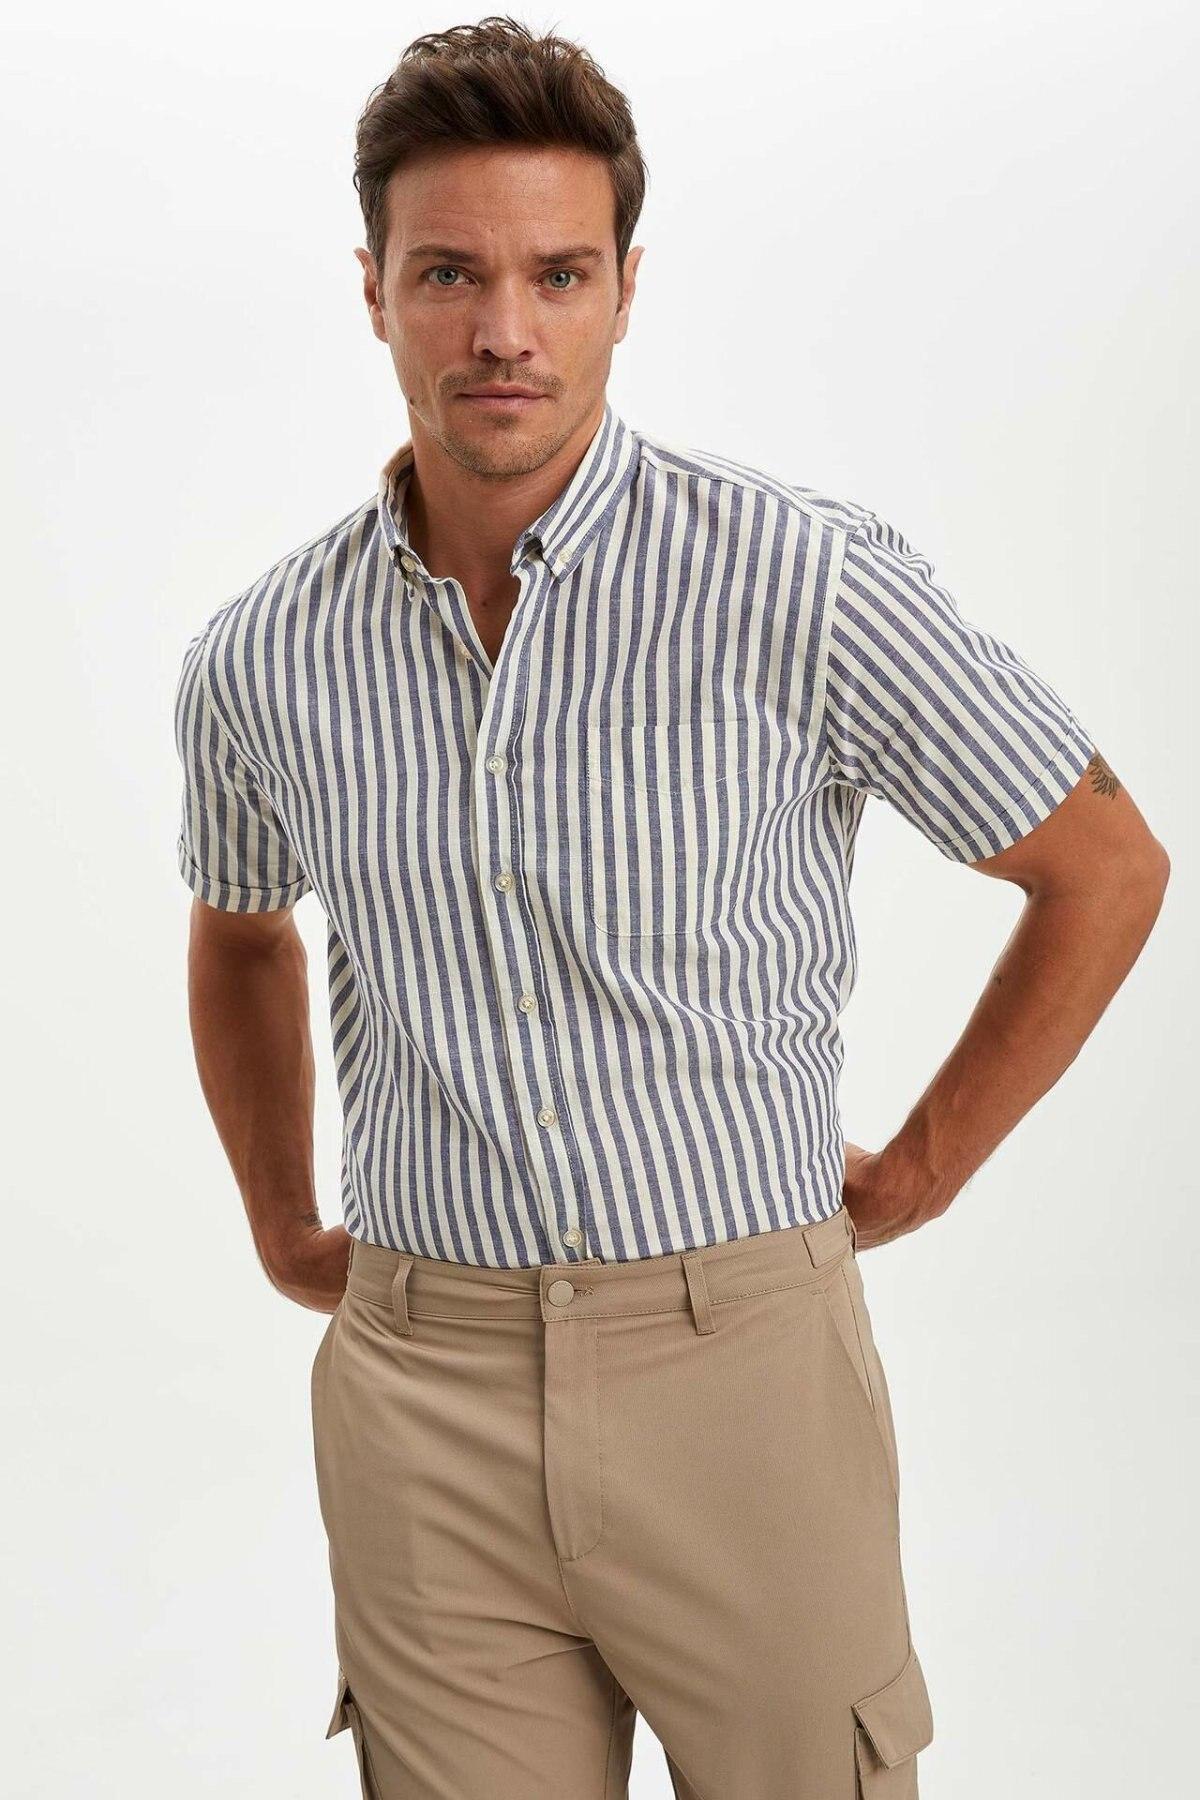 DeFacto Man Short Sleeve Shirt Men's Casual Shirts Men's Black Striped Shirts Men's White Top Shirts-N6368AZ20SM